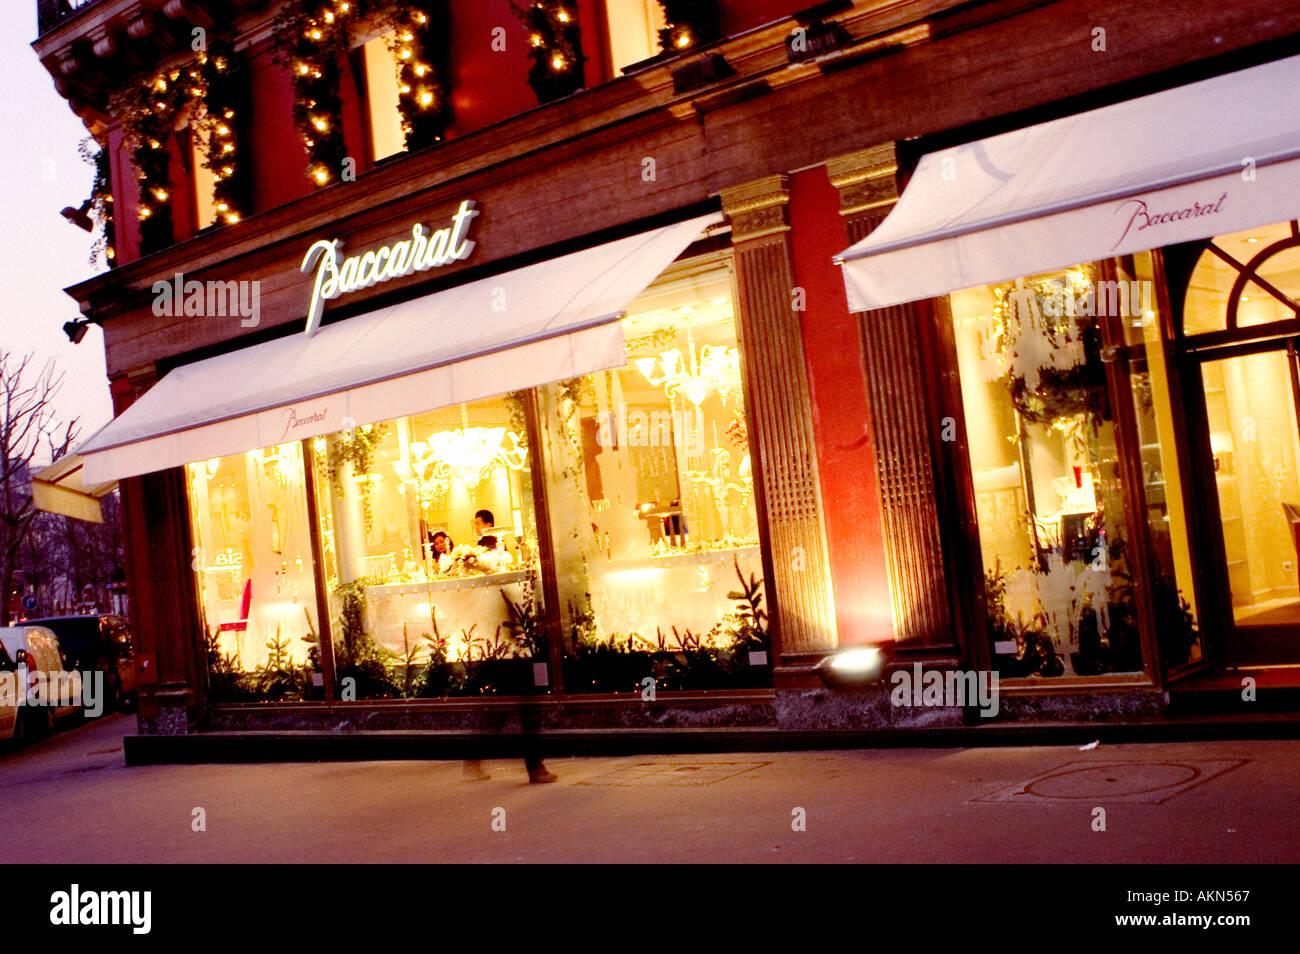 paris france stores luxury baccarat crystal place de la madeleine stock photo 2790758 alamy. Black Bedroom Furniture Sets. Home Design Ideas